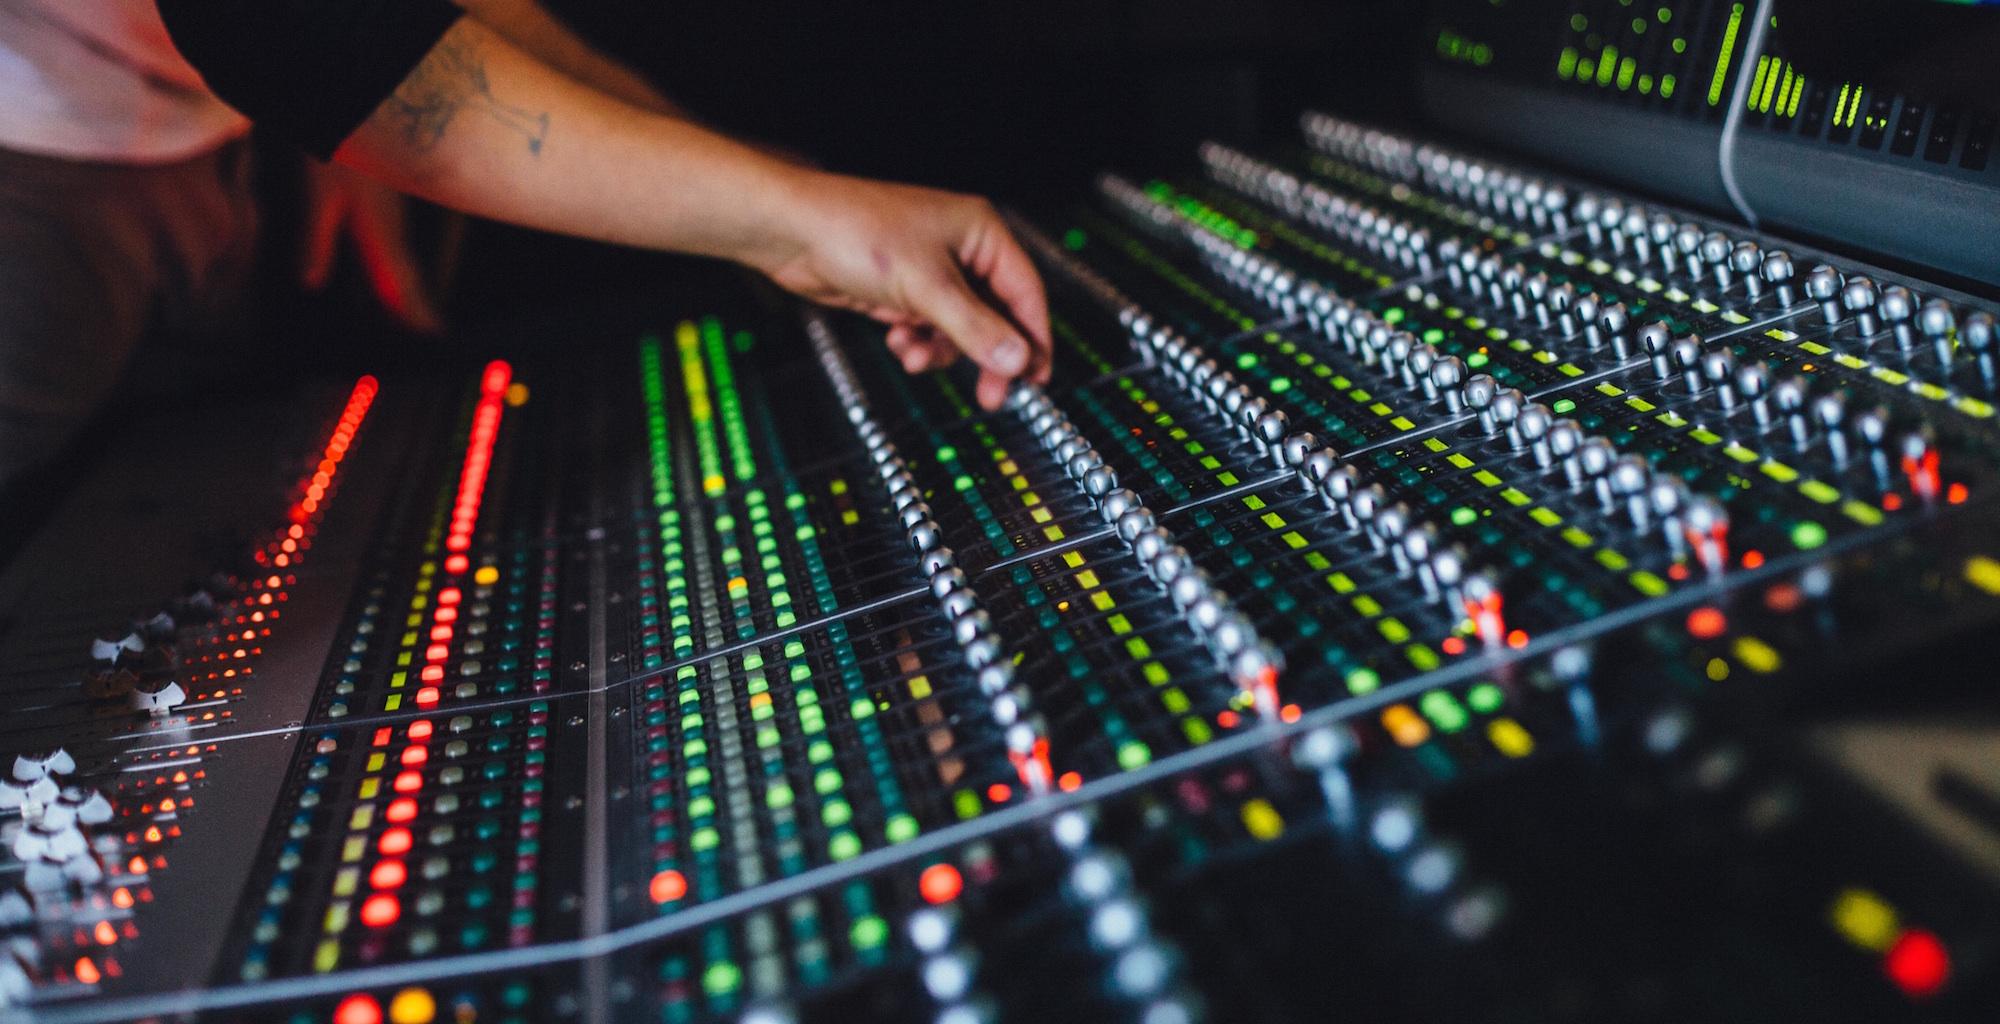 Music meets code